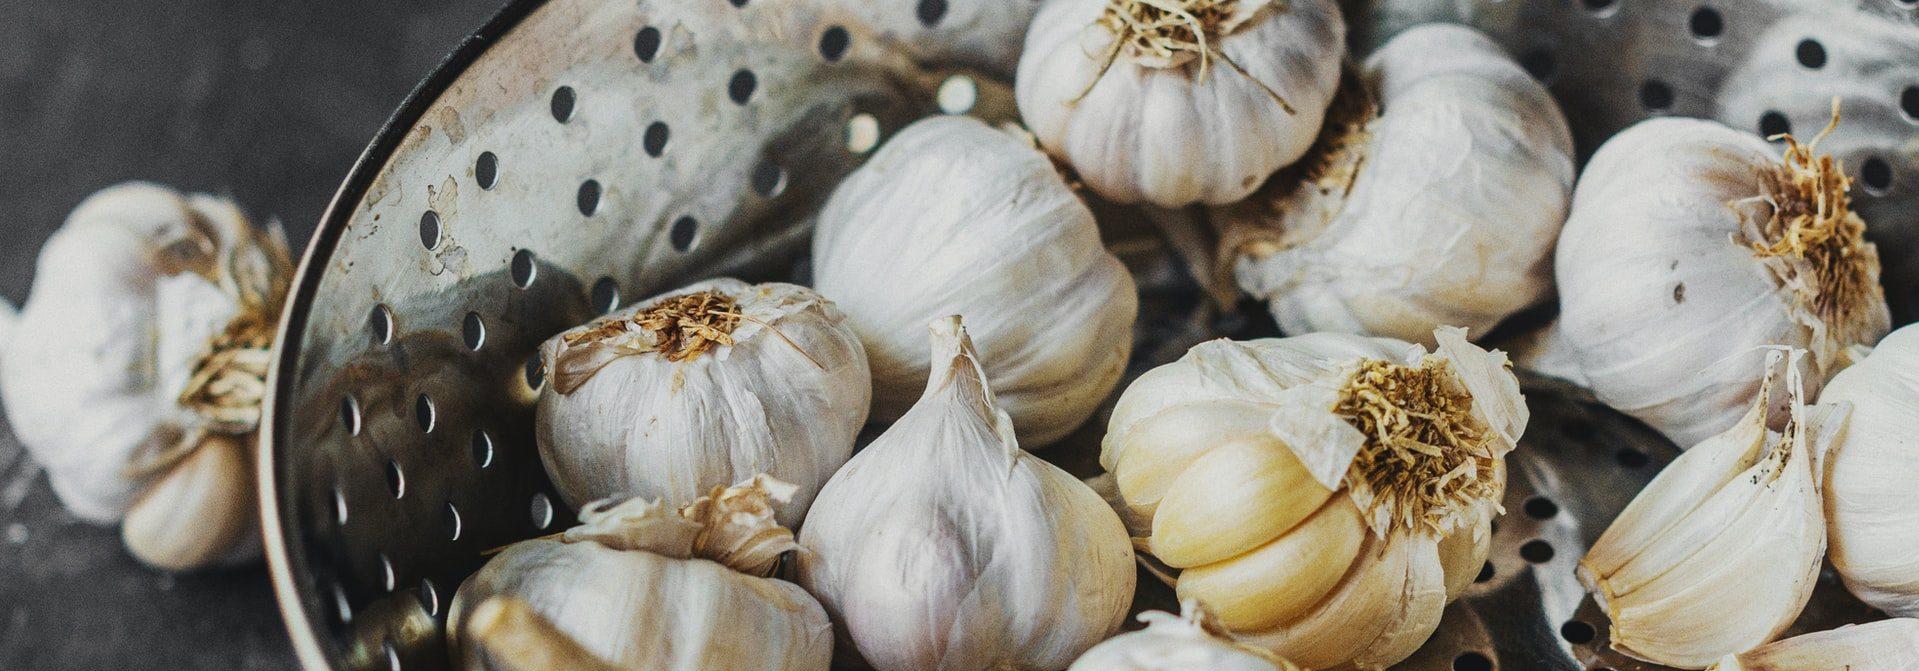 Cinco alimentos funcionais para cuidar da saúde